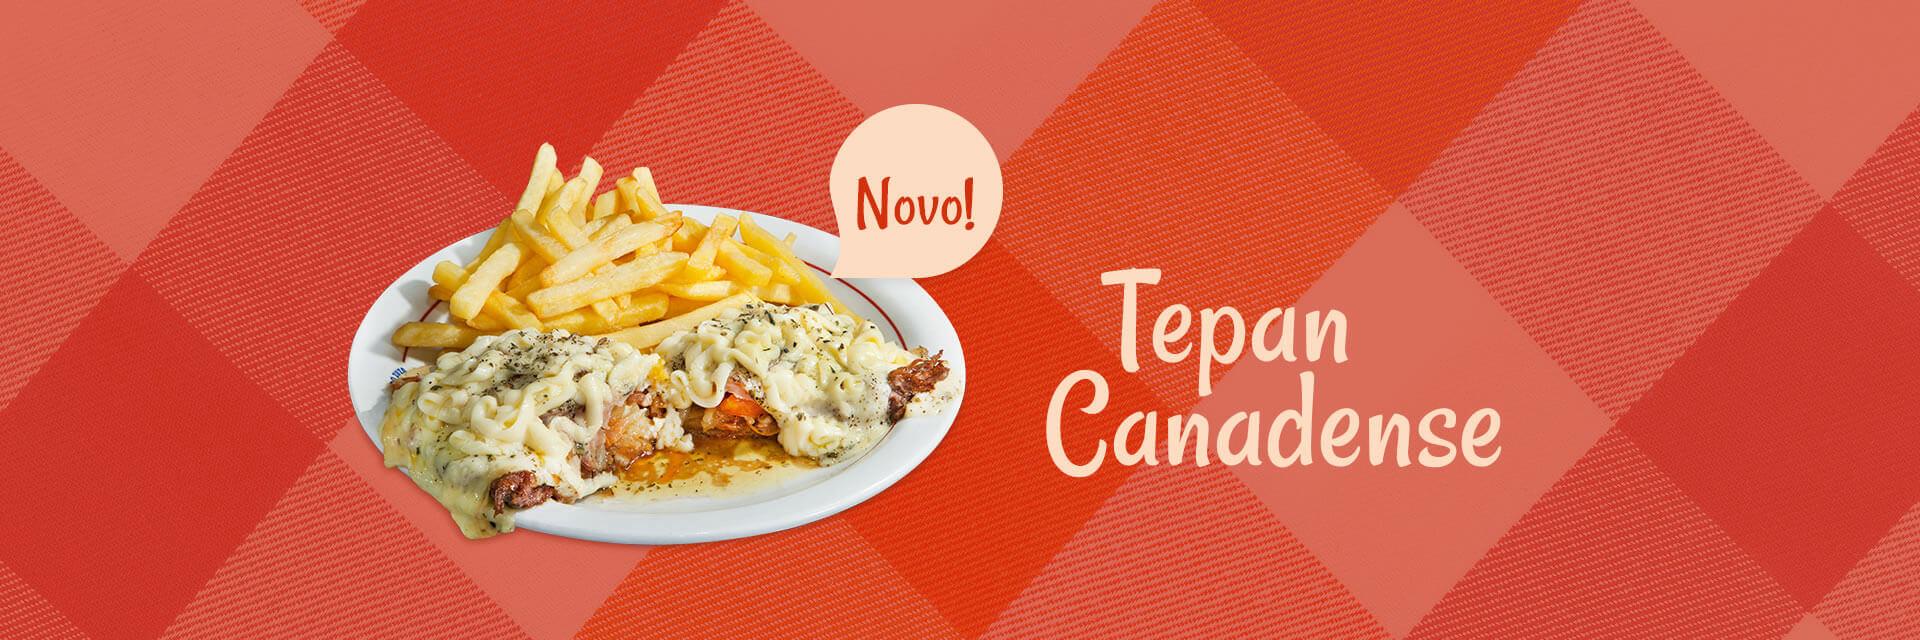 banner-tepan-canadense